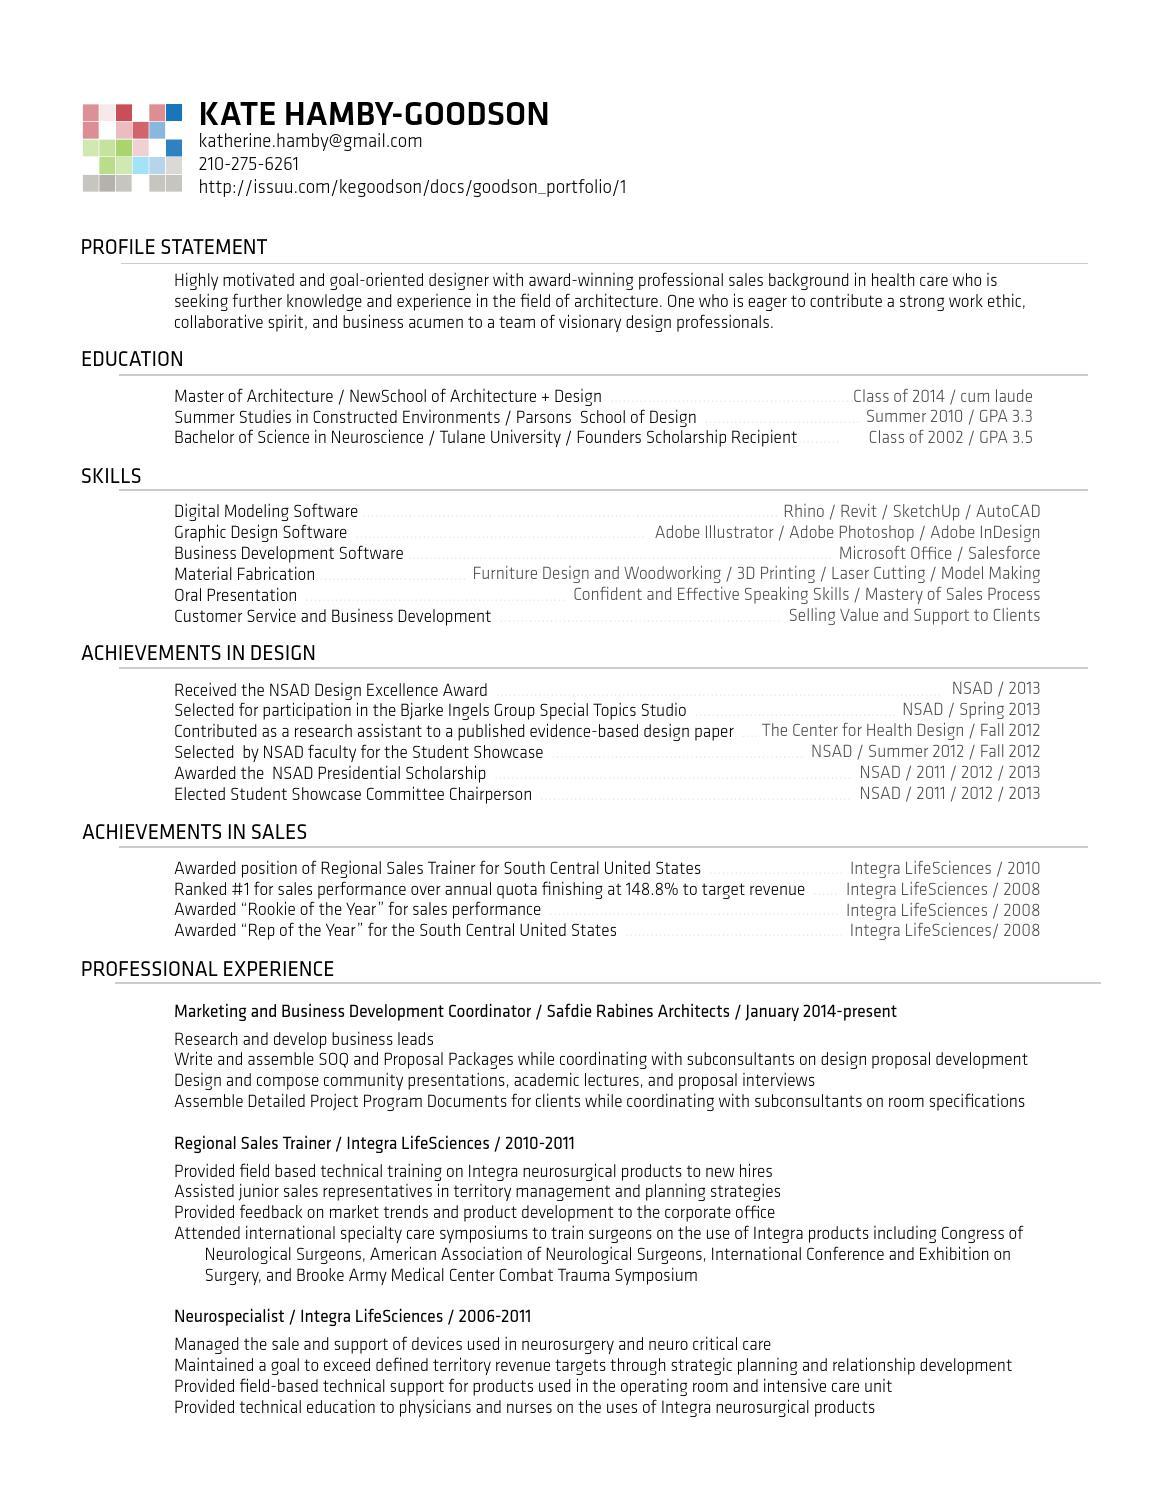 resume kate hamby-goodson by kate goodson